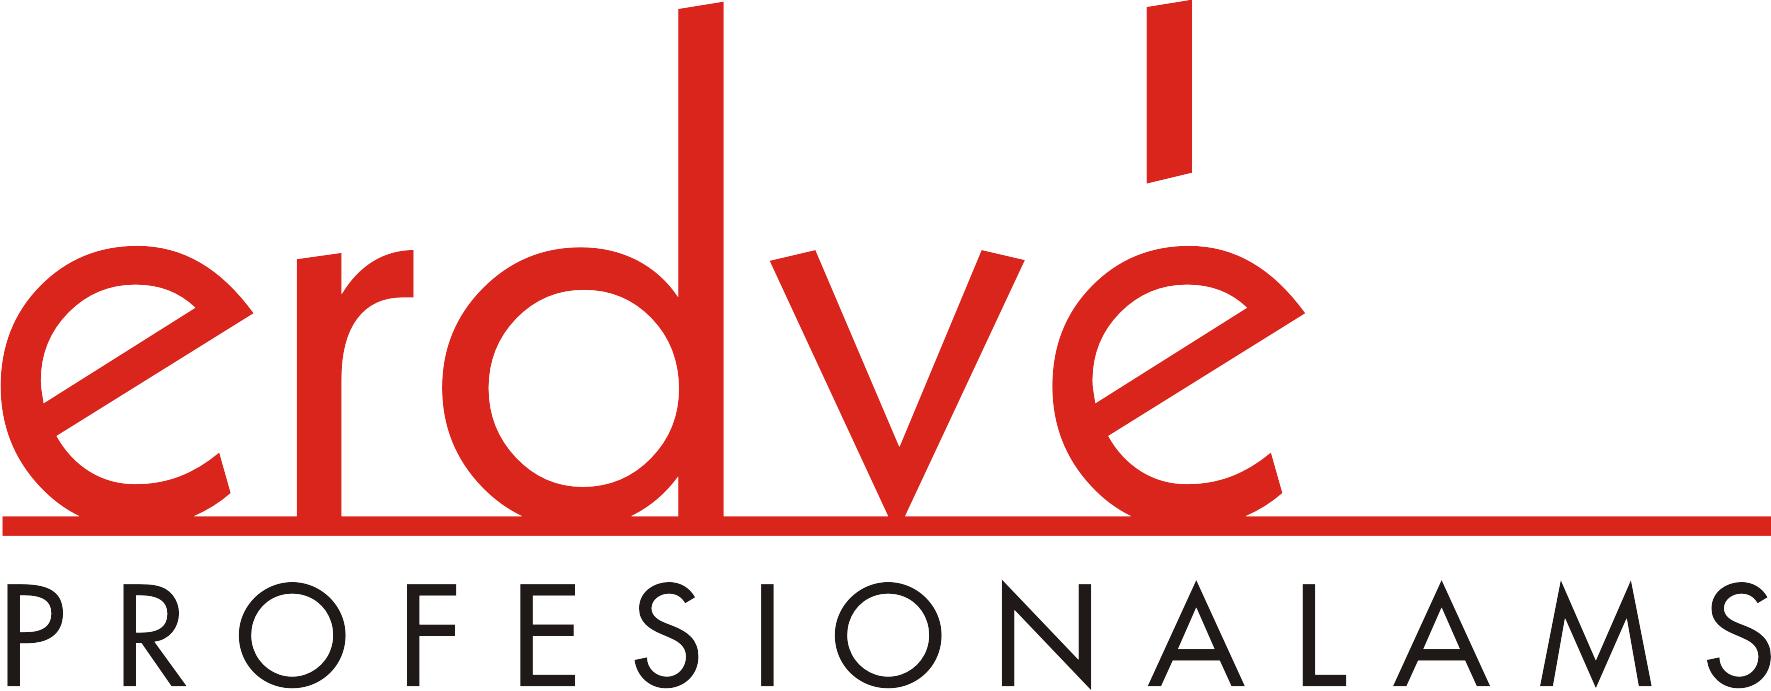 erdve-profi-logo-3